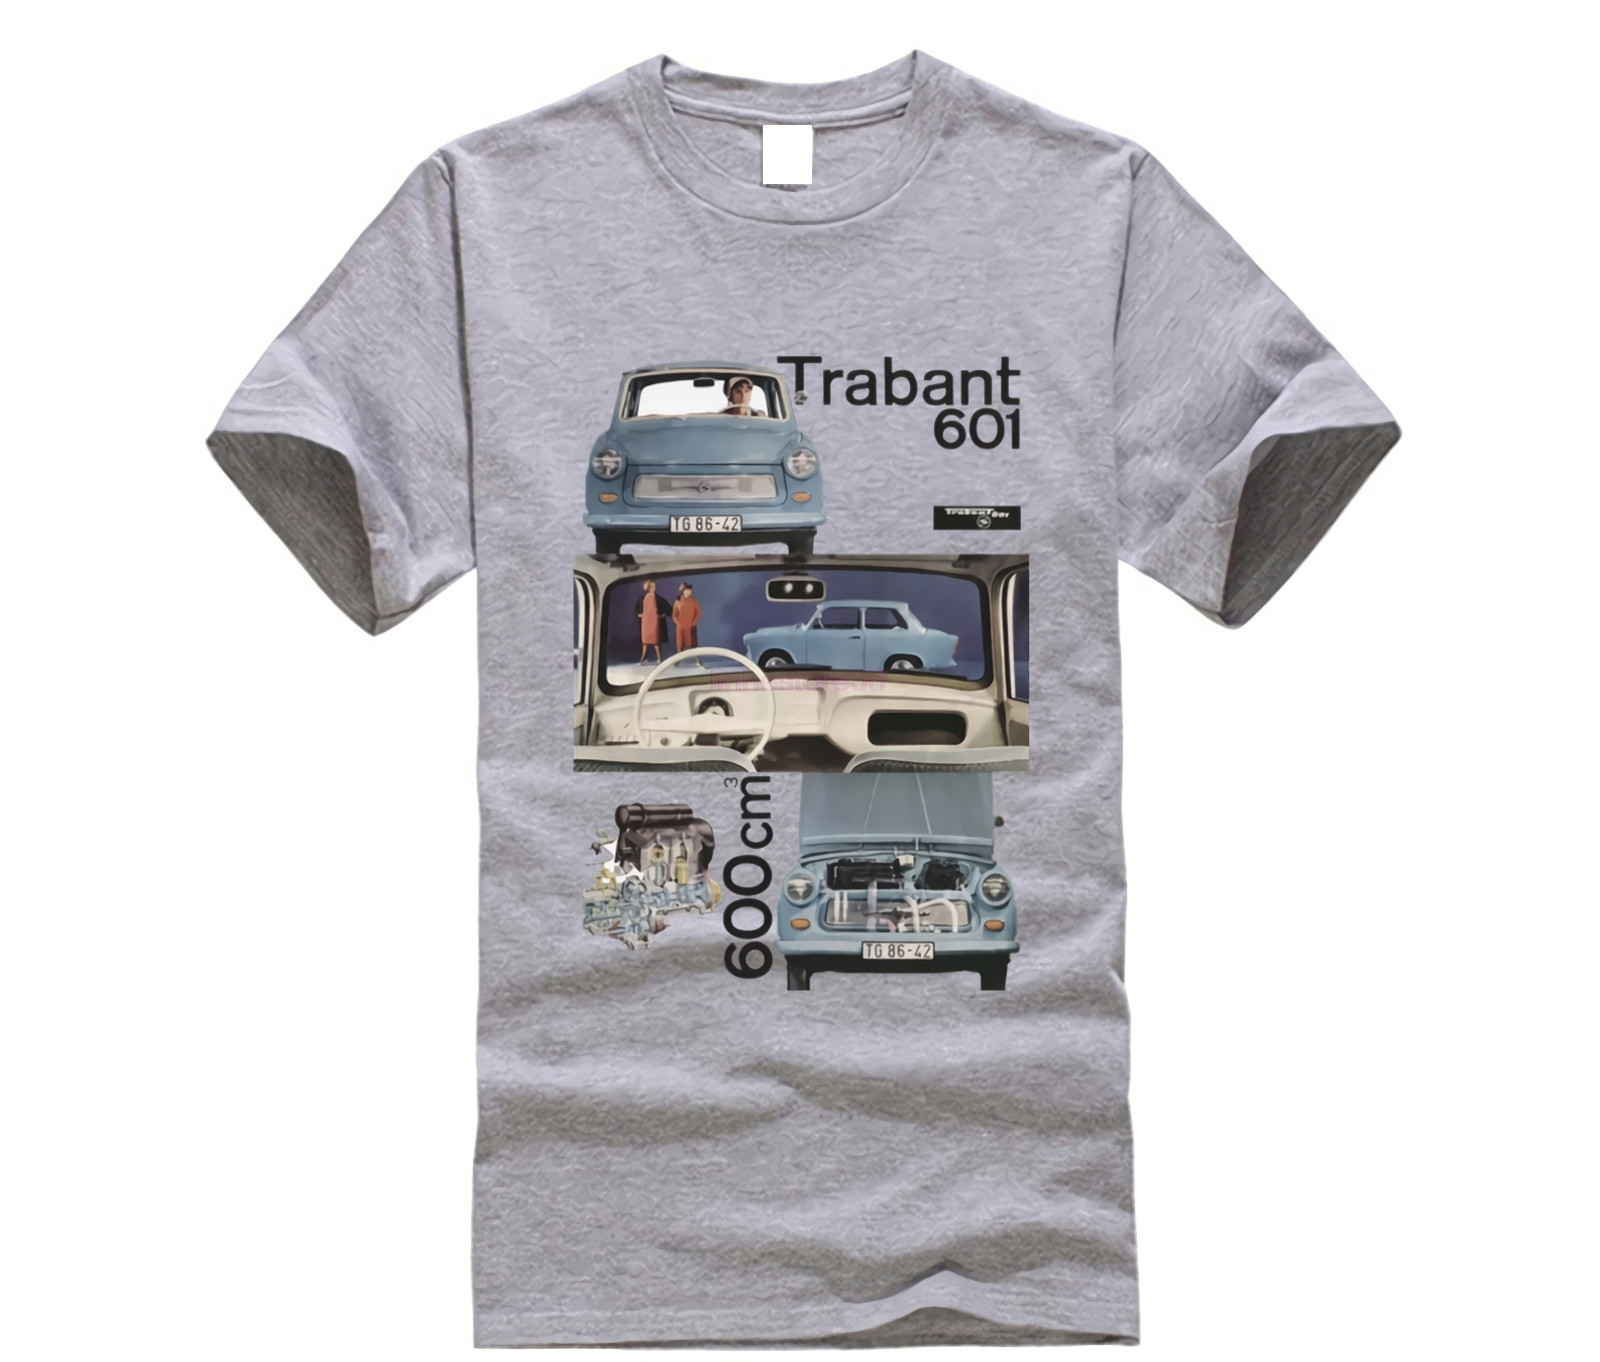 2aa8b7cd4 T-Shirt 2019 Fashion Men T-SHIRT MAGLIA GERMANIA EST COMUNISMO TRABANT AUTO  VINTAGE